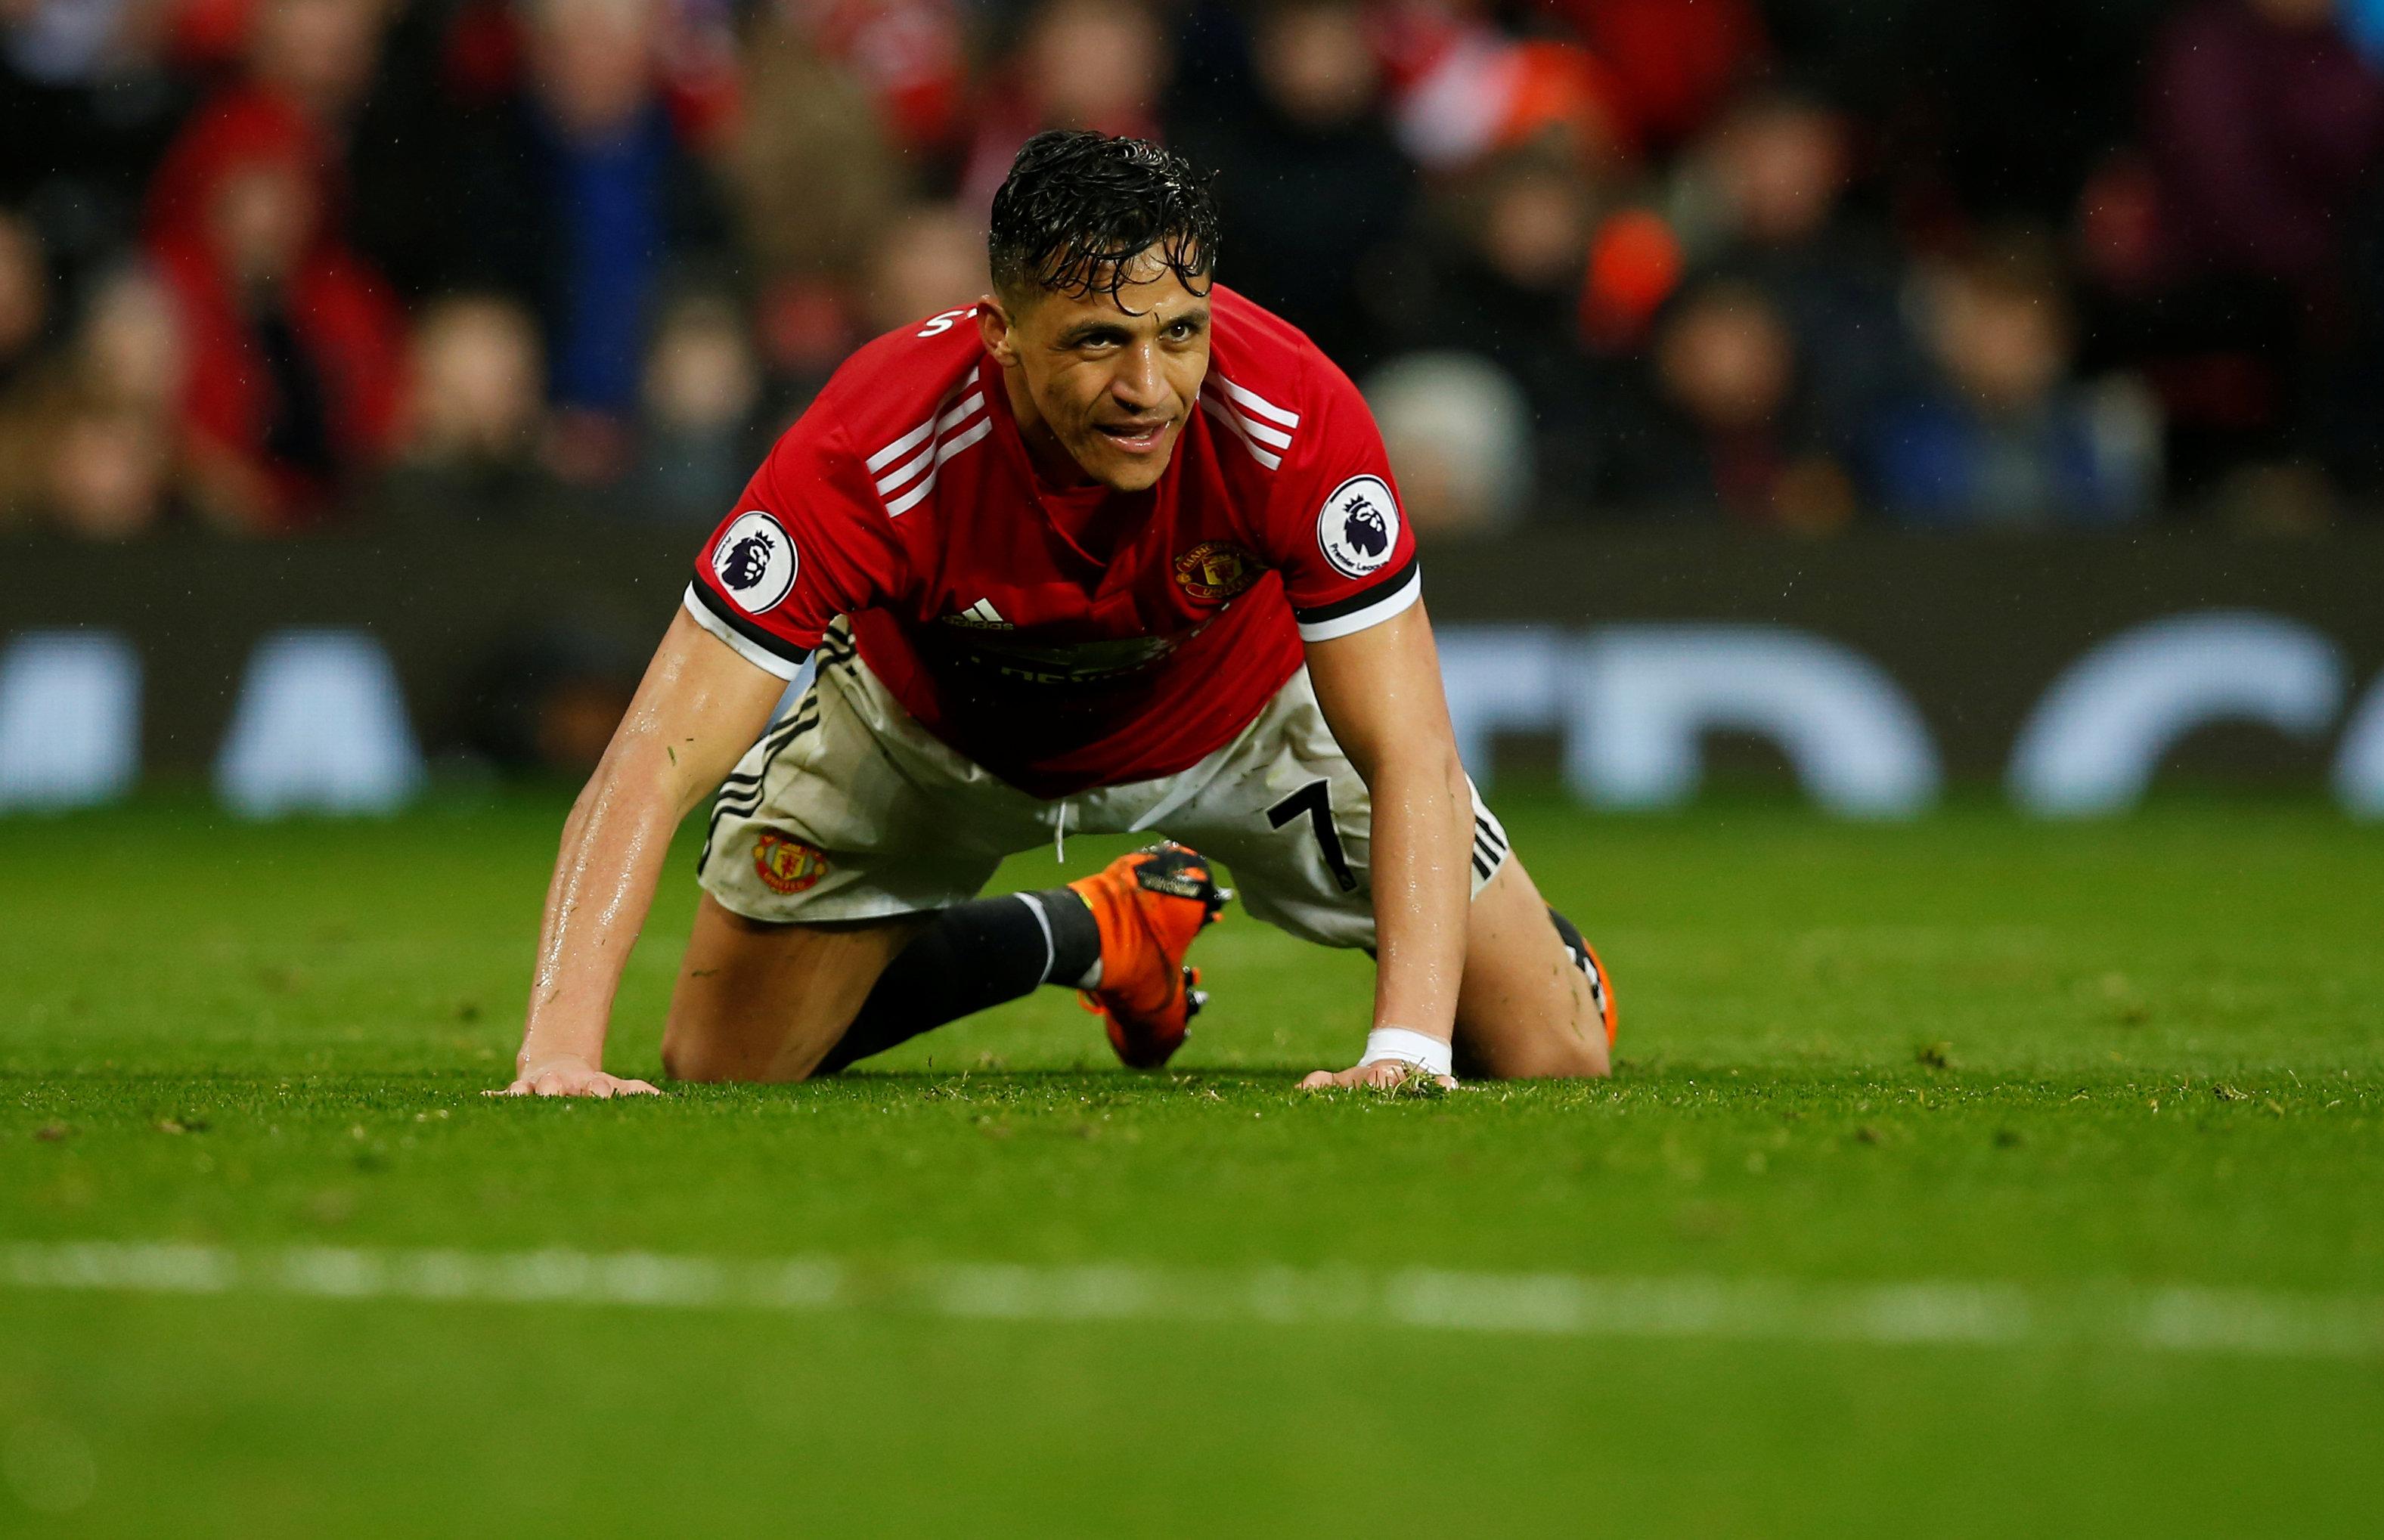 Vẻ mặt thất vọng của Sanchez sau trận thua West Brom. Ảnh: REUTERS